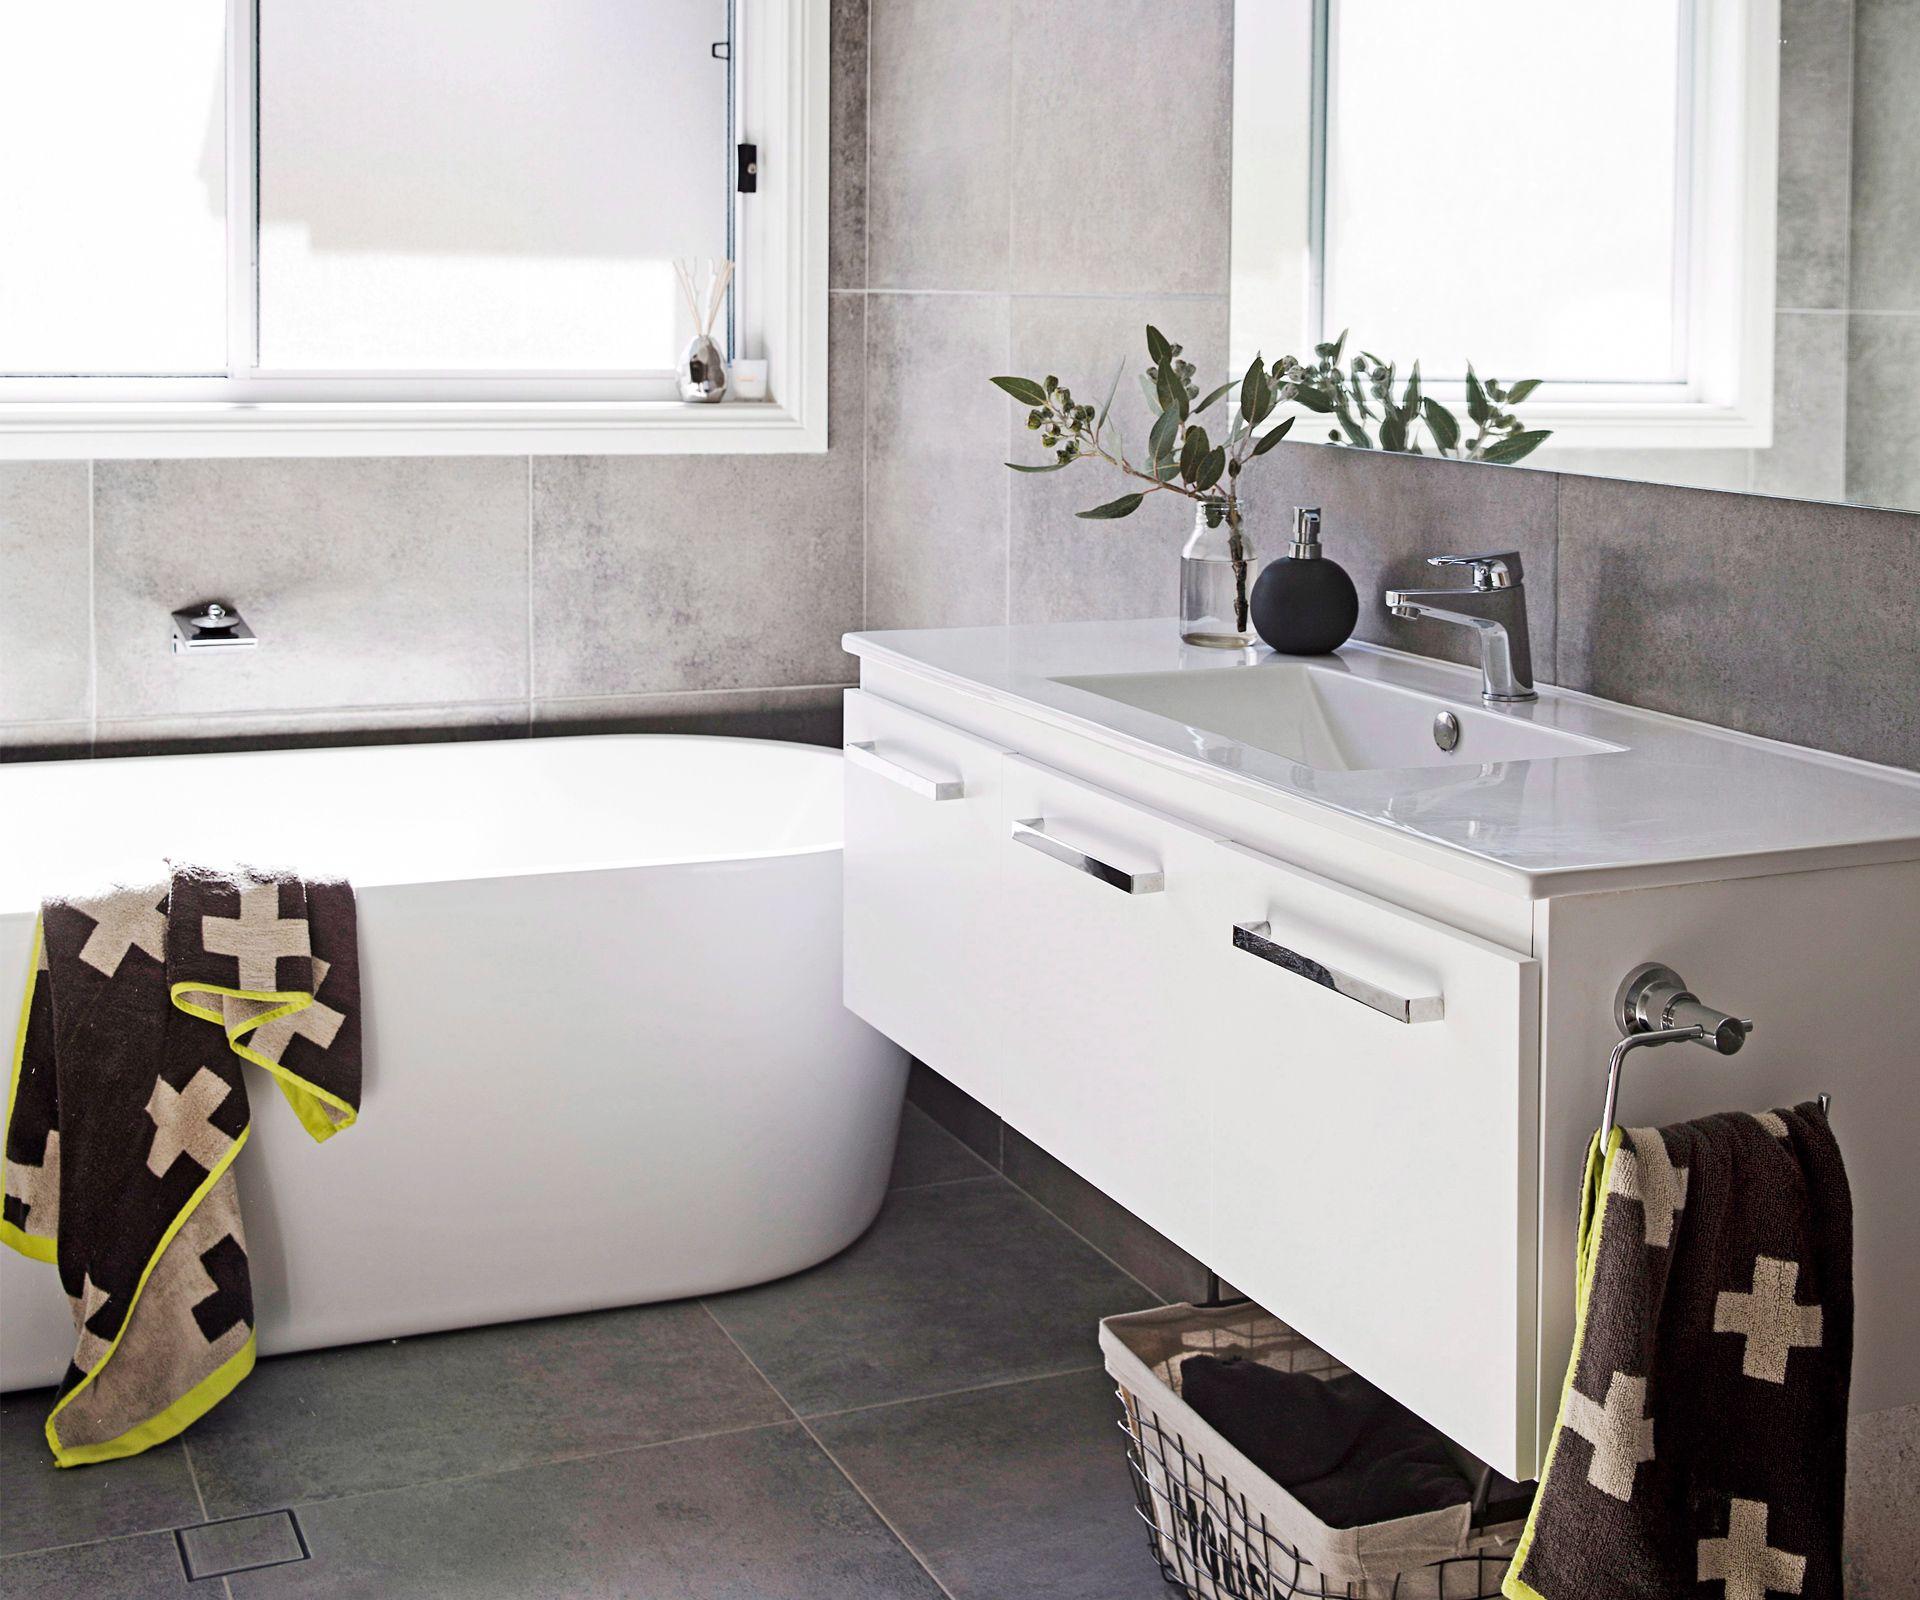 The Top 10 Rules Of Bathroom Design Bathrooms Small Bathroom Small Bathroom Renovations Small Bathroom Vanities